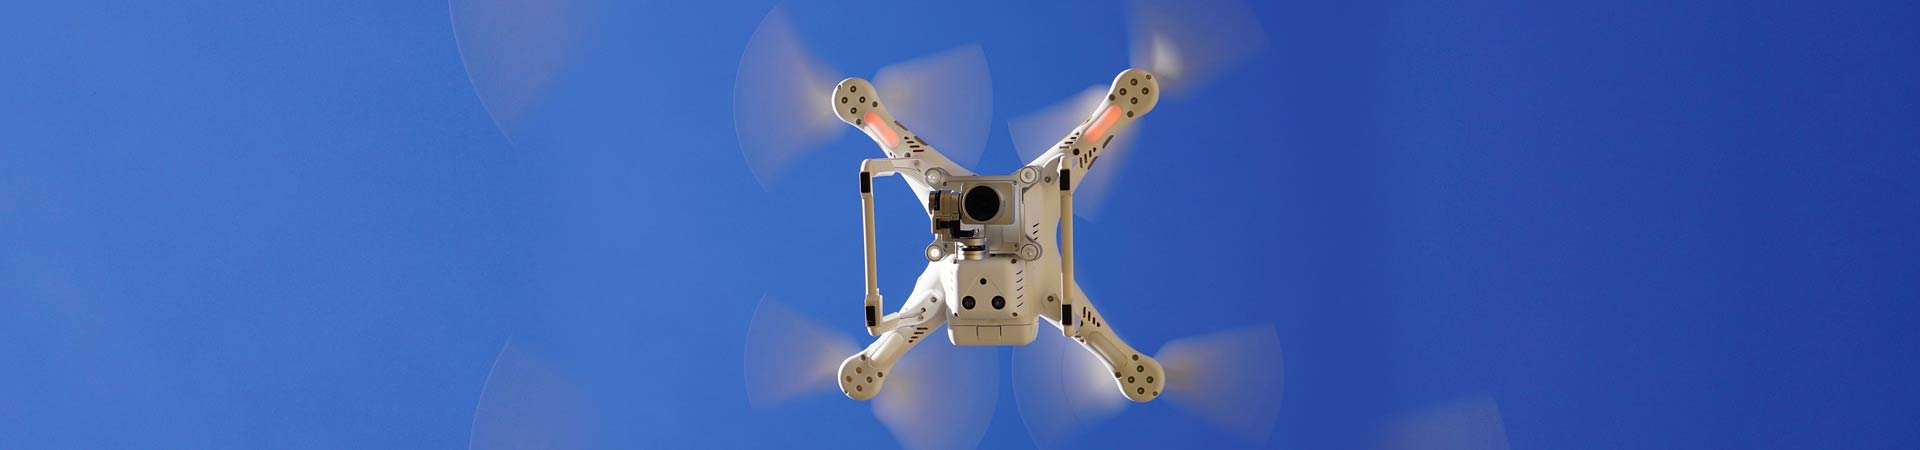 drones radars